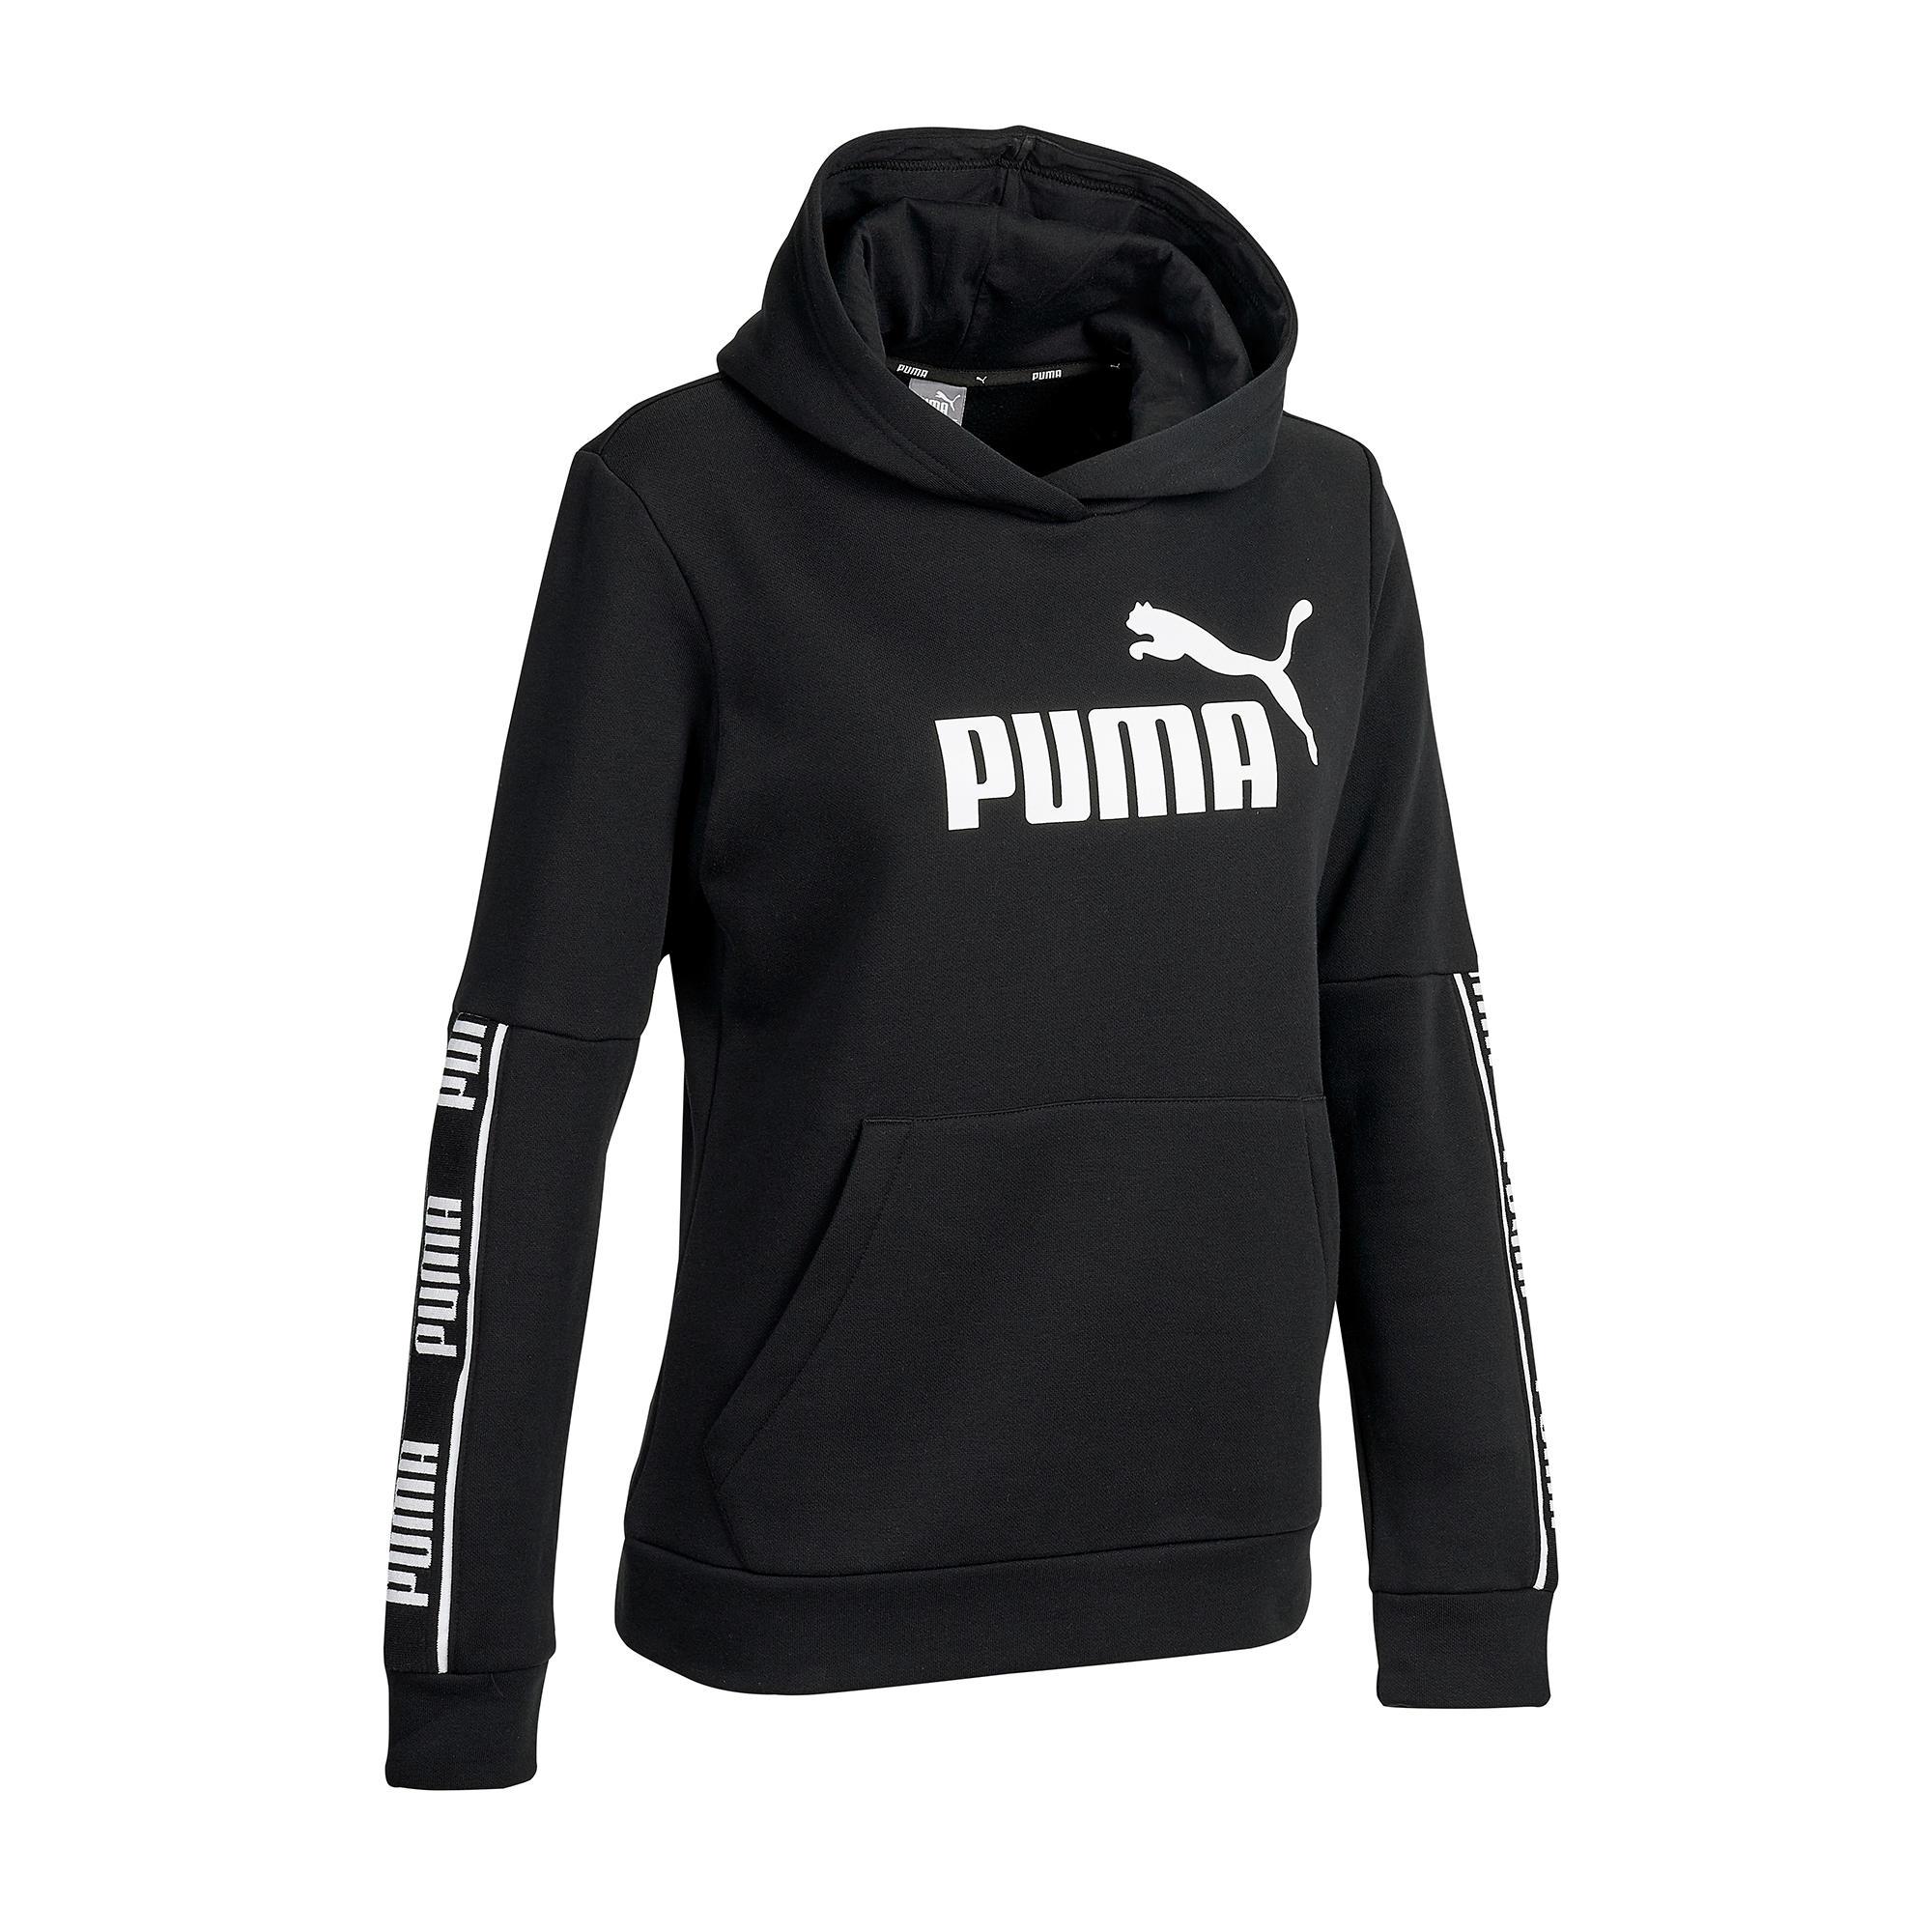 Veste jogging puma femme